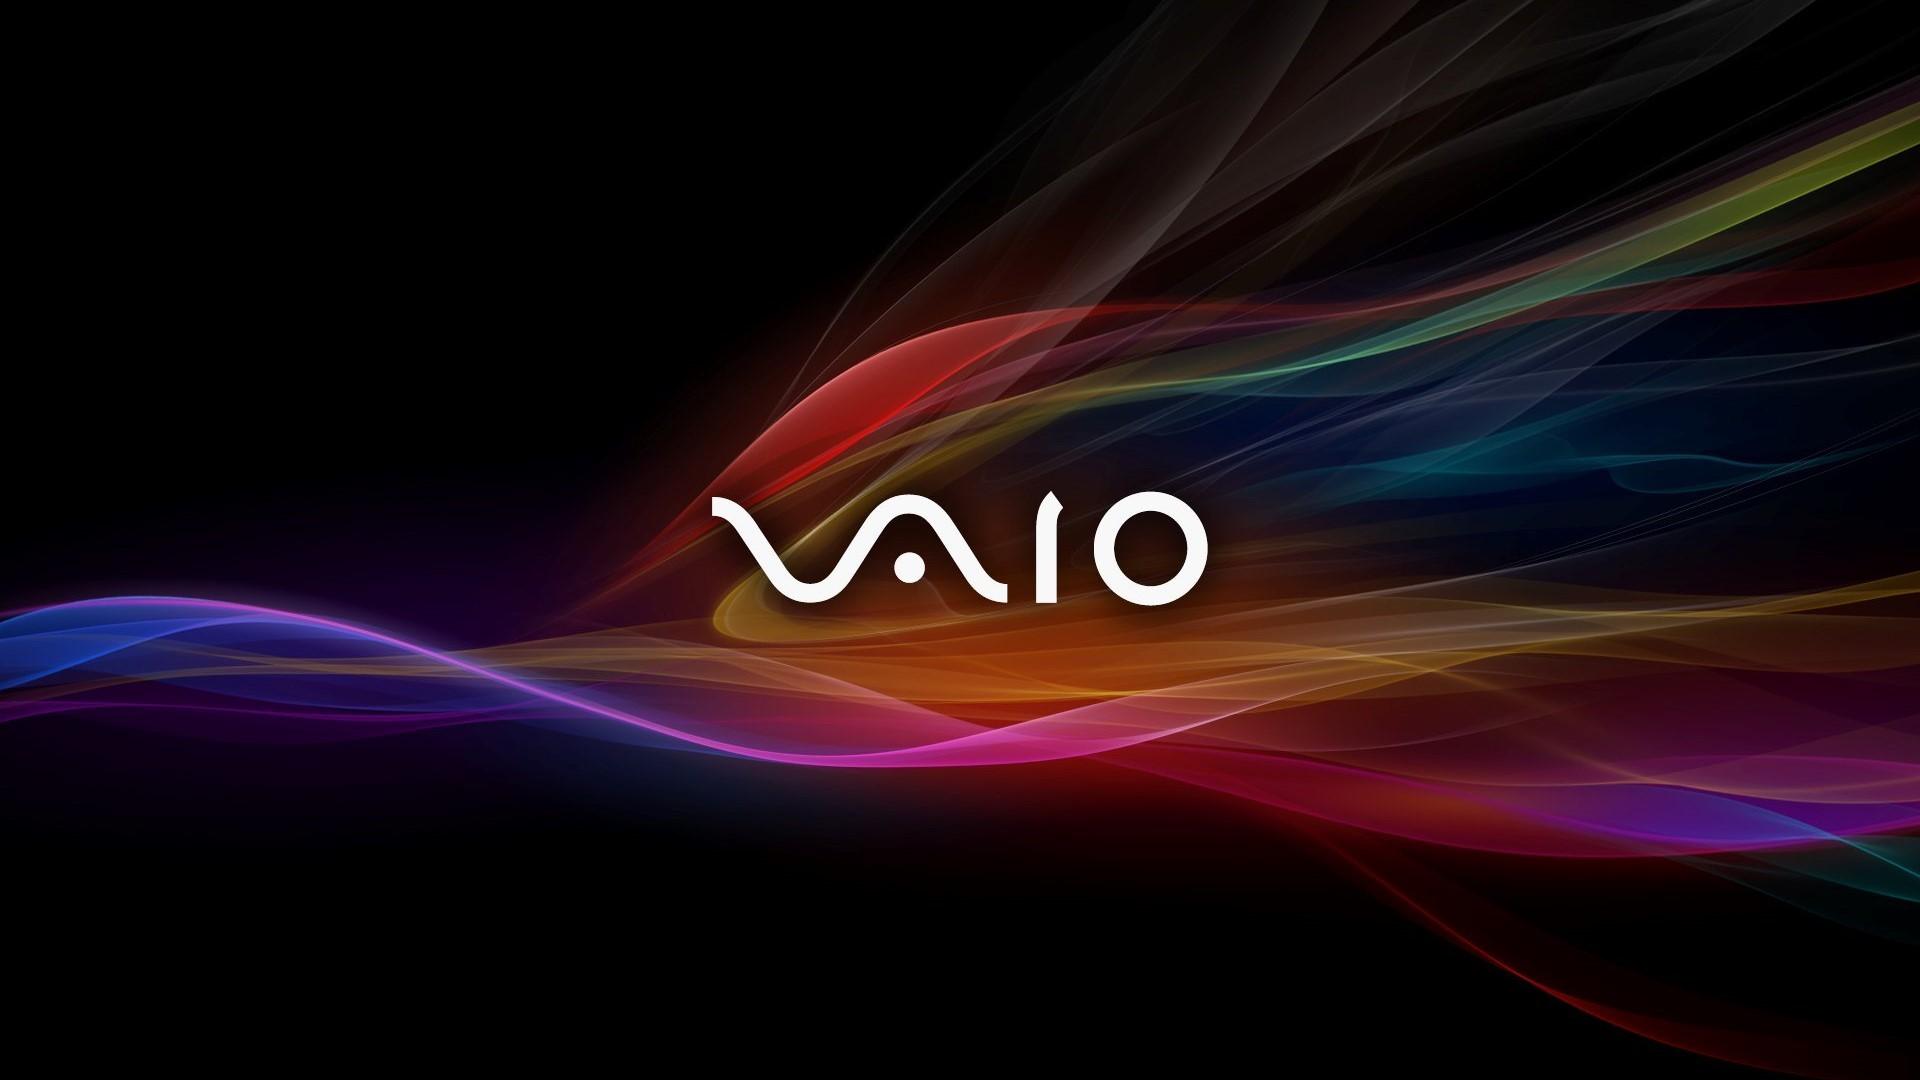 Sony Vaio Wallpaper Hd wallpaper   1313928 1920x1080